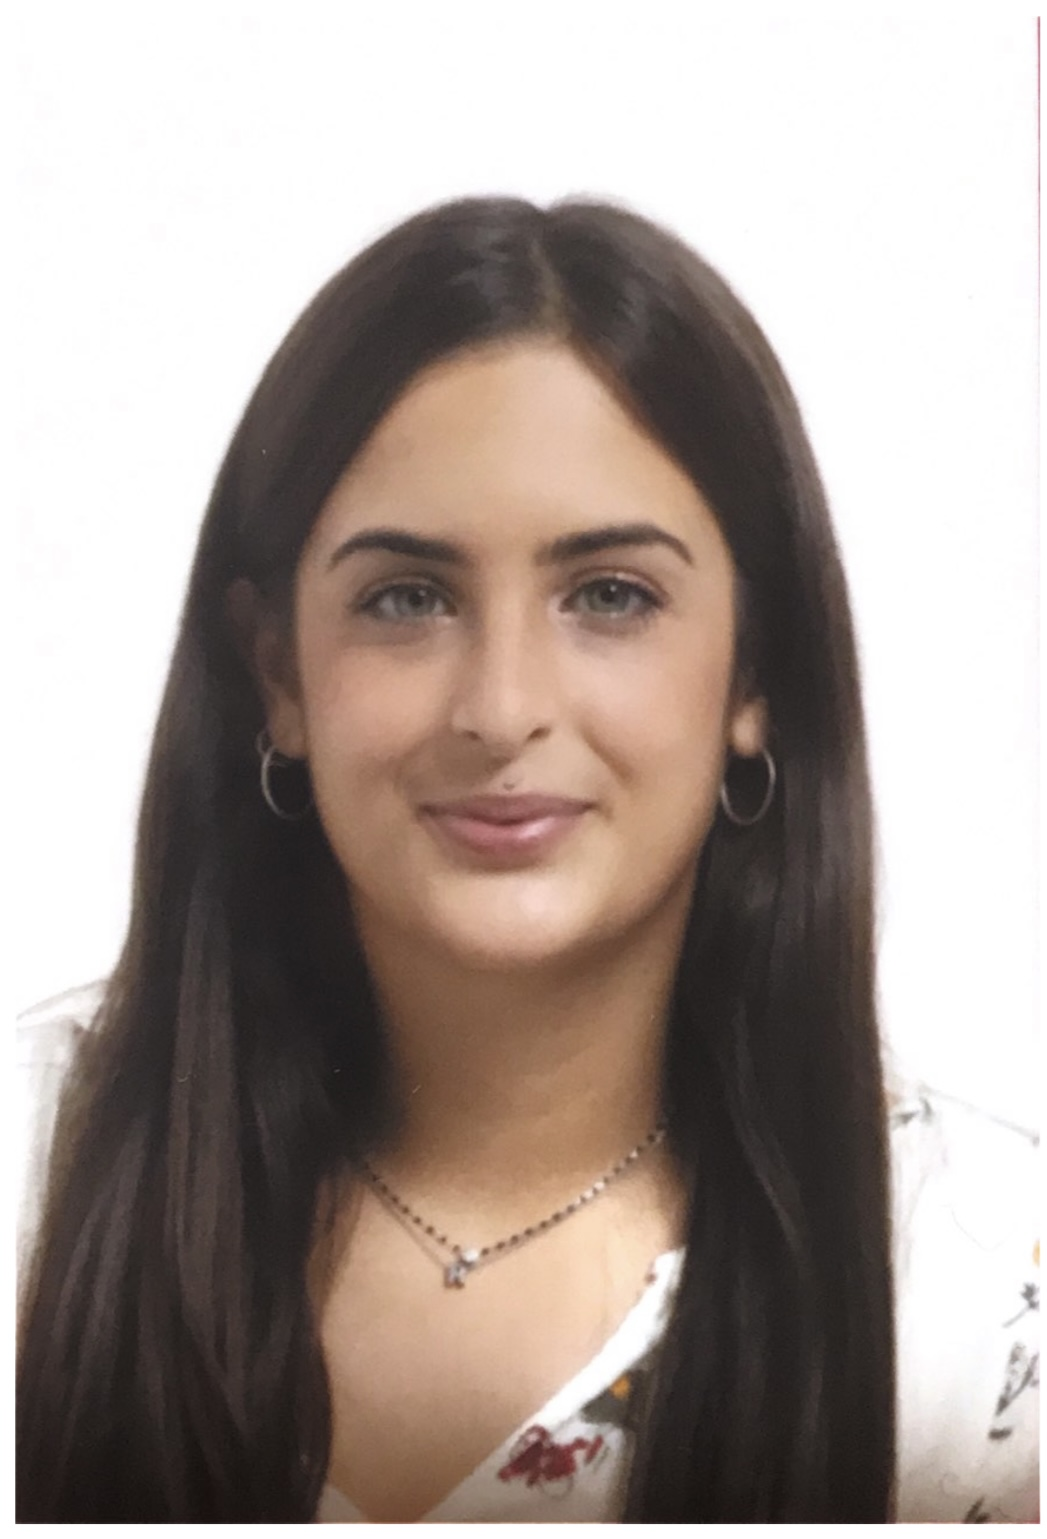 Rosa Romero Pérez